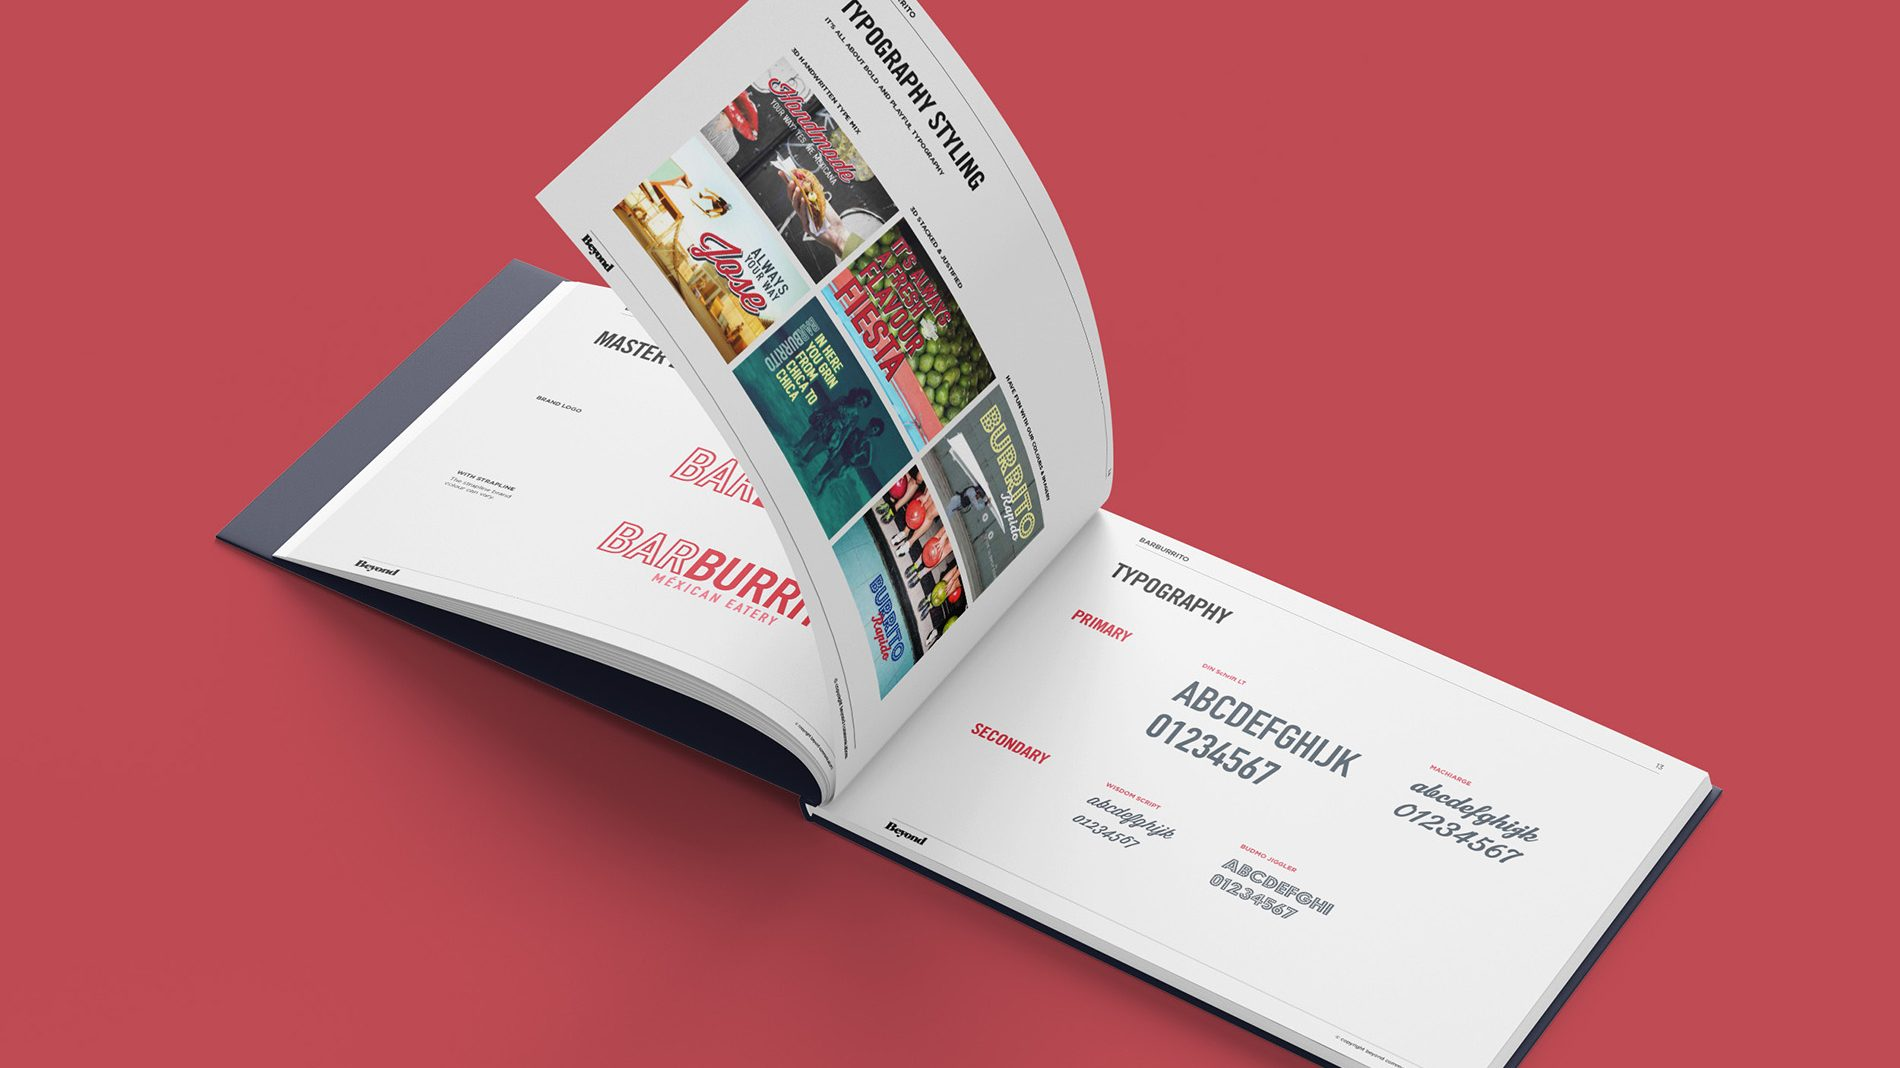 beyond london Barburrito branding graphic design F&B